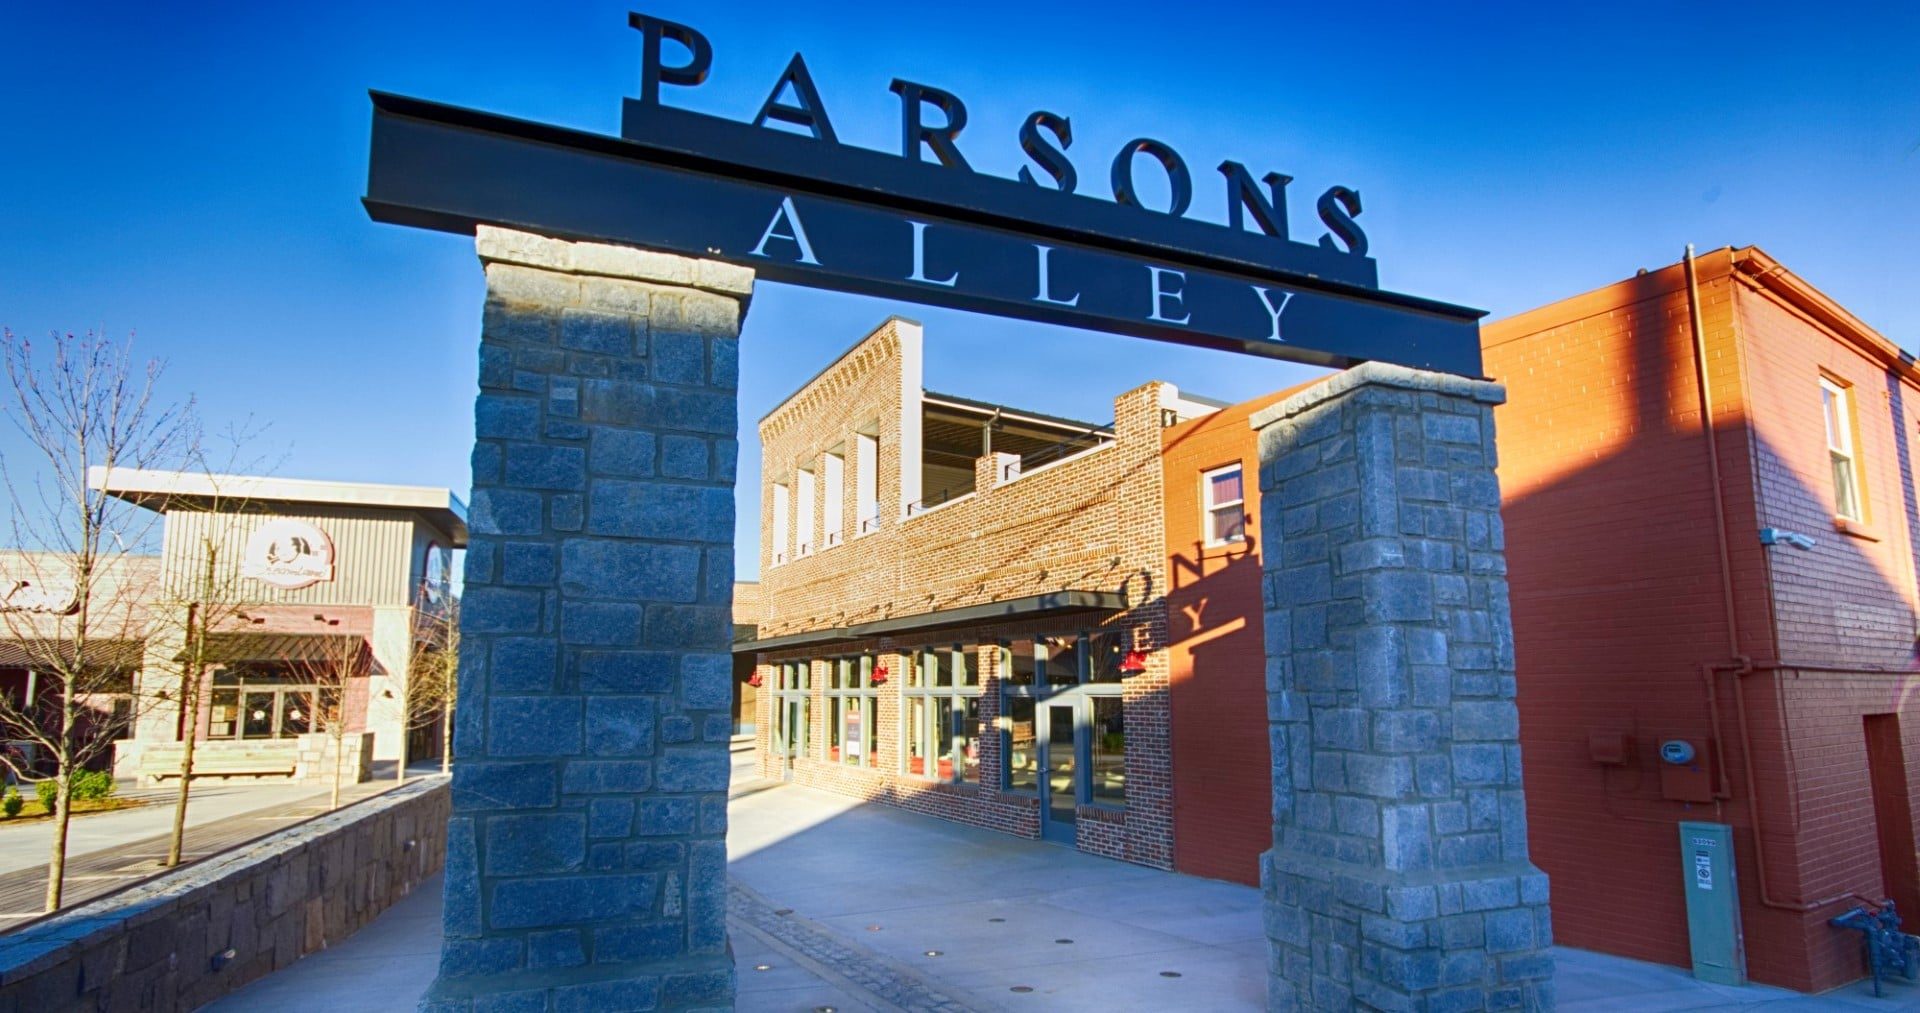 Parsons Alley Duluth Georgia